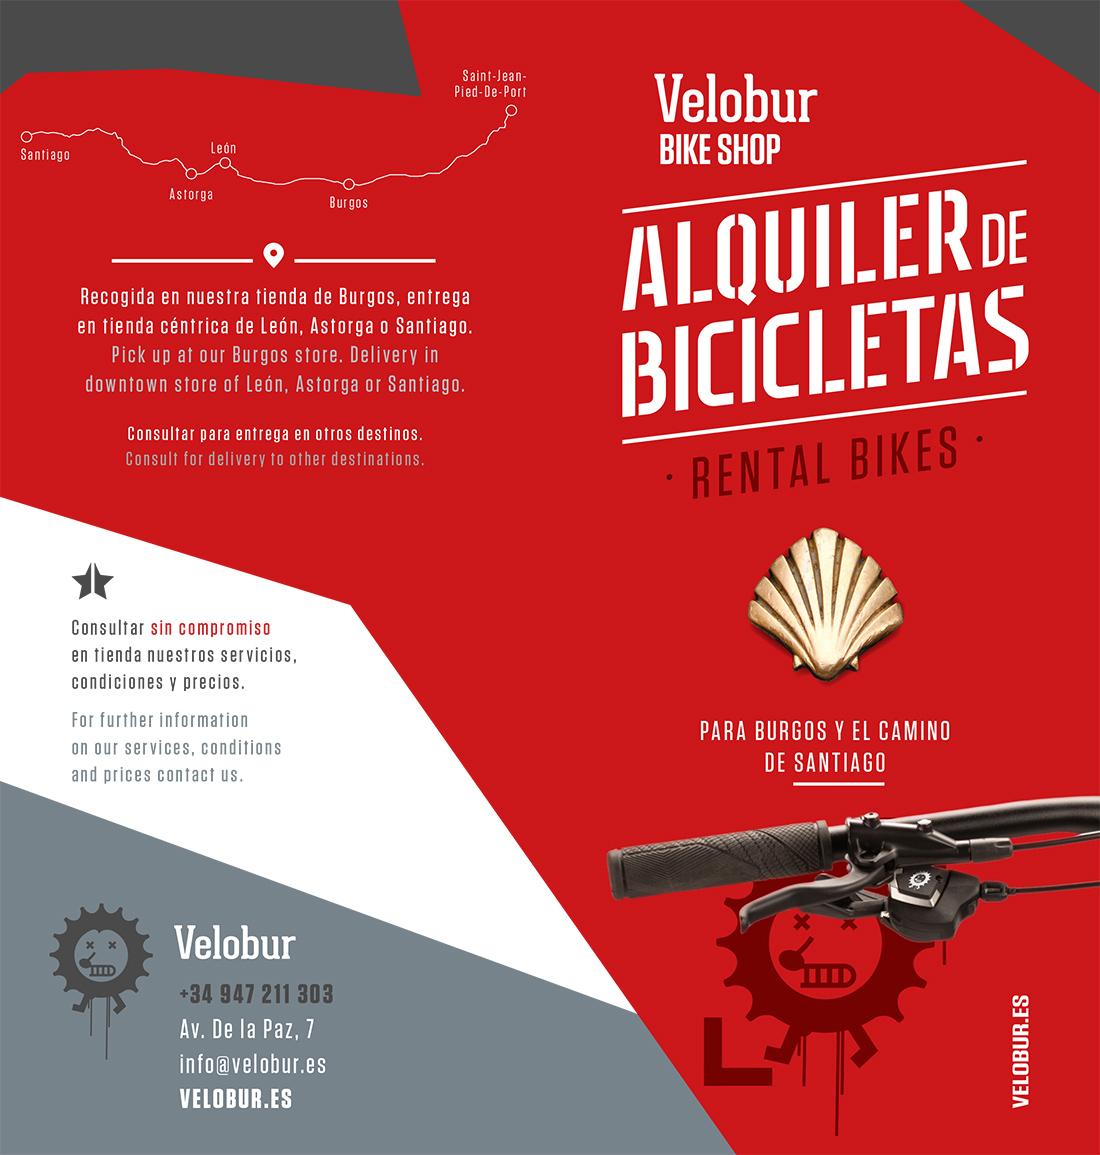 Velobur_alquiler_bicicleta_camino_Santiago.jpg